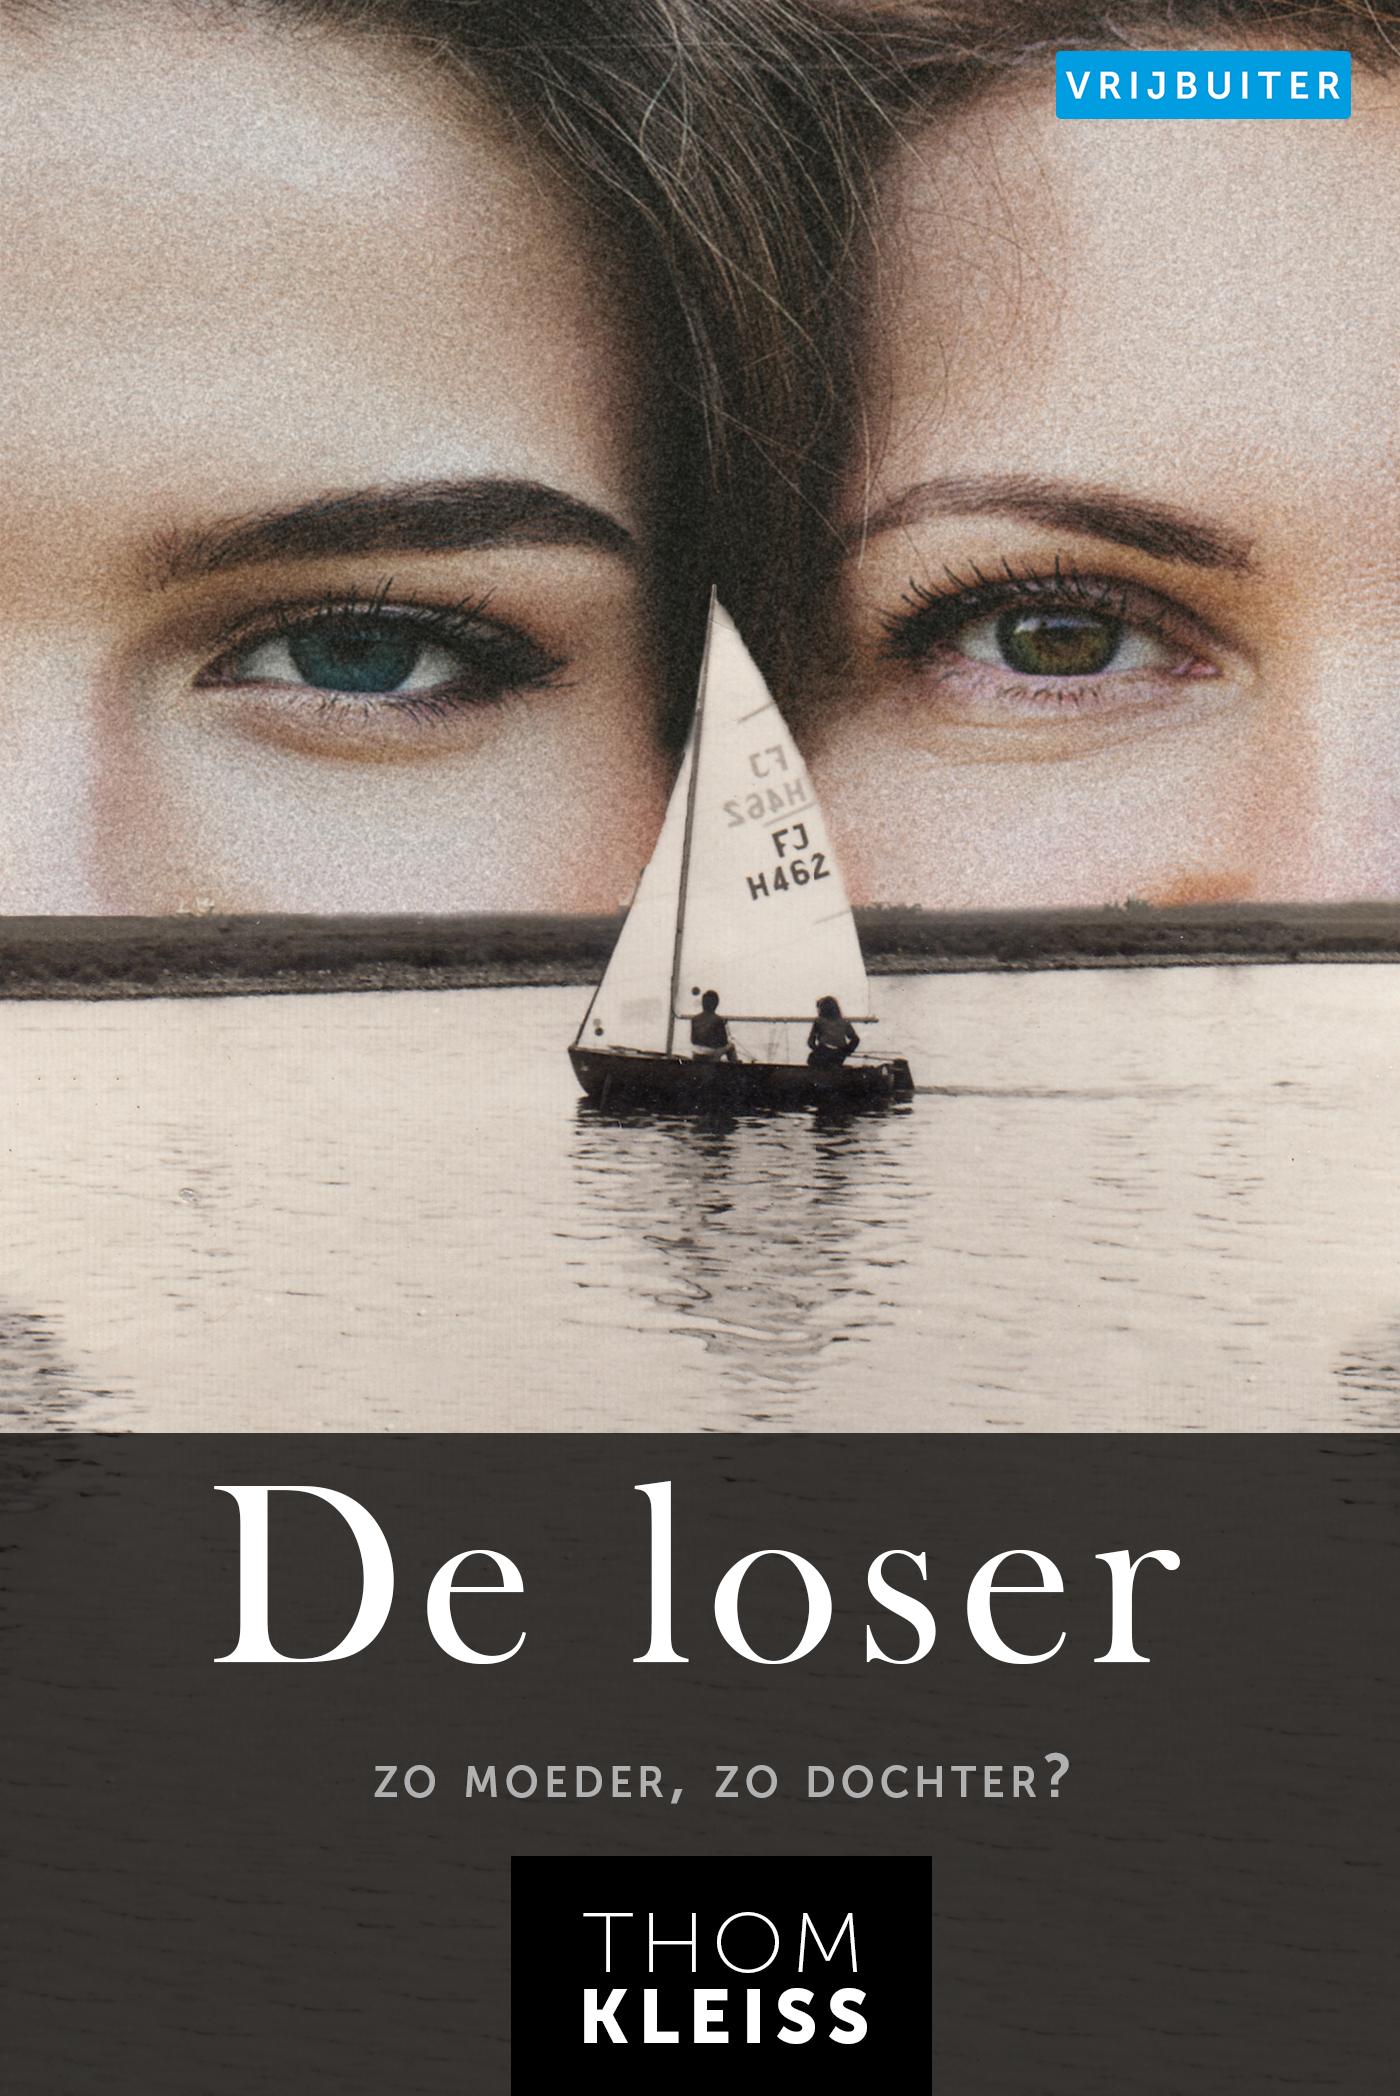 cover-vogelvrij-De loser